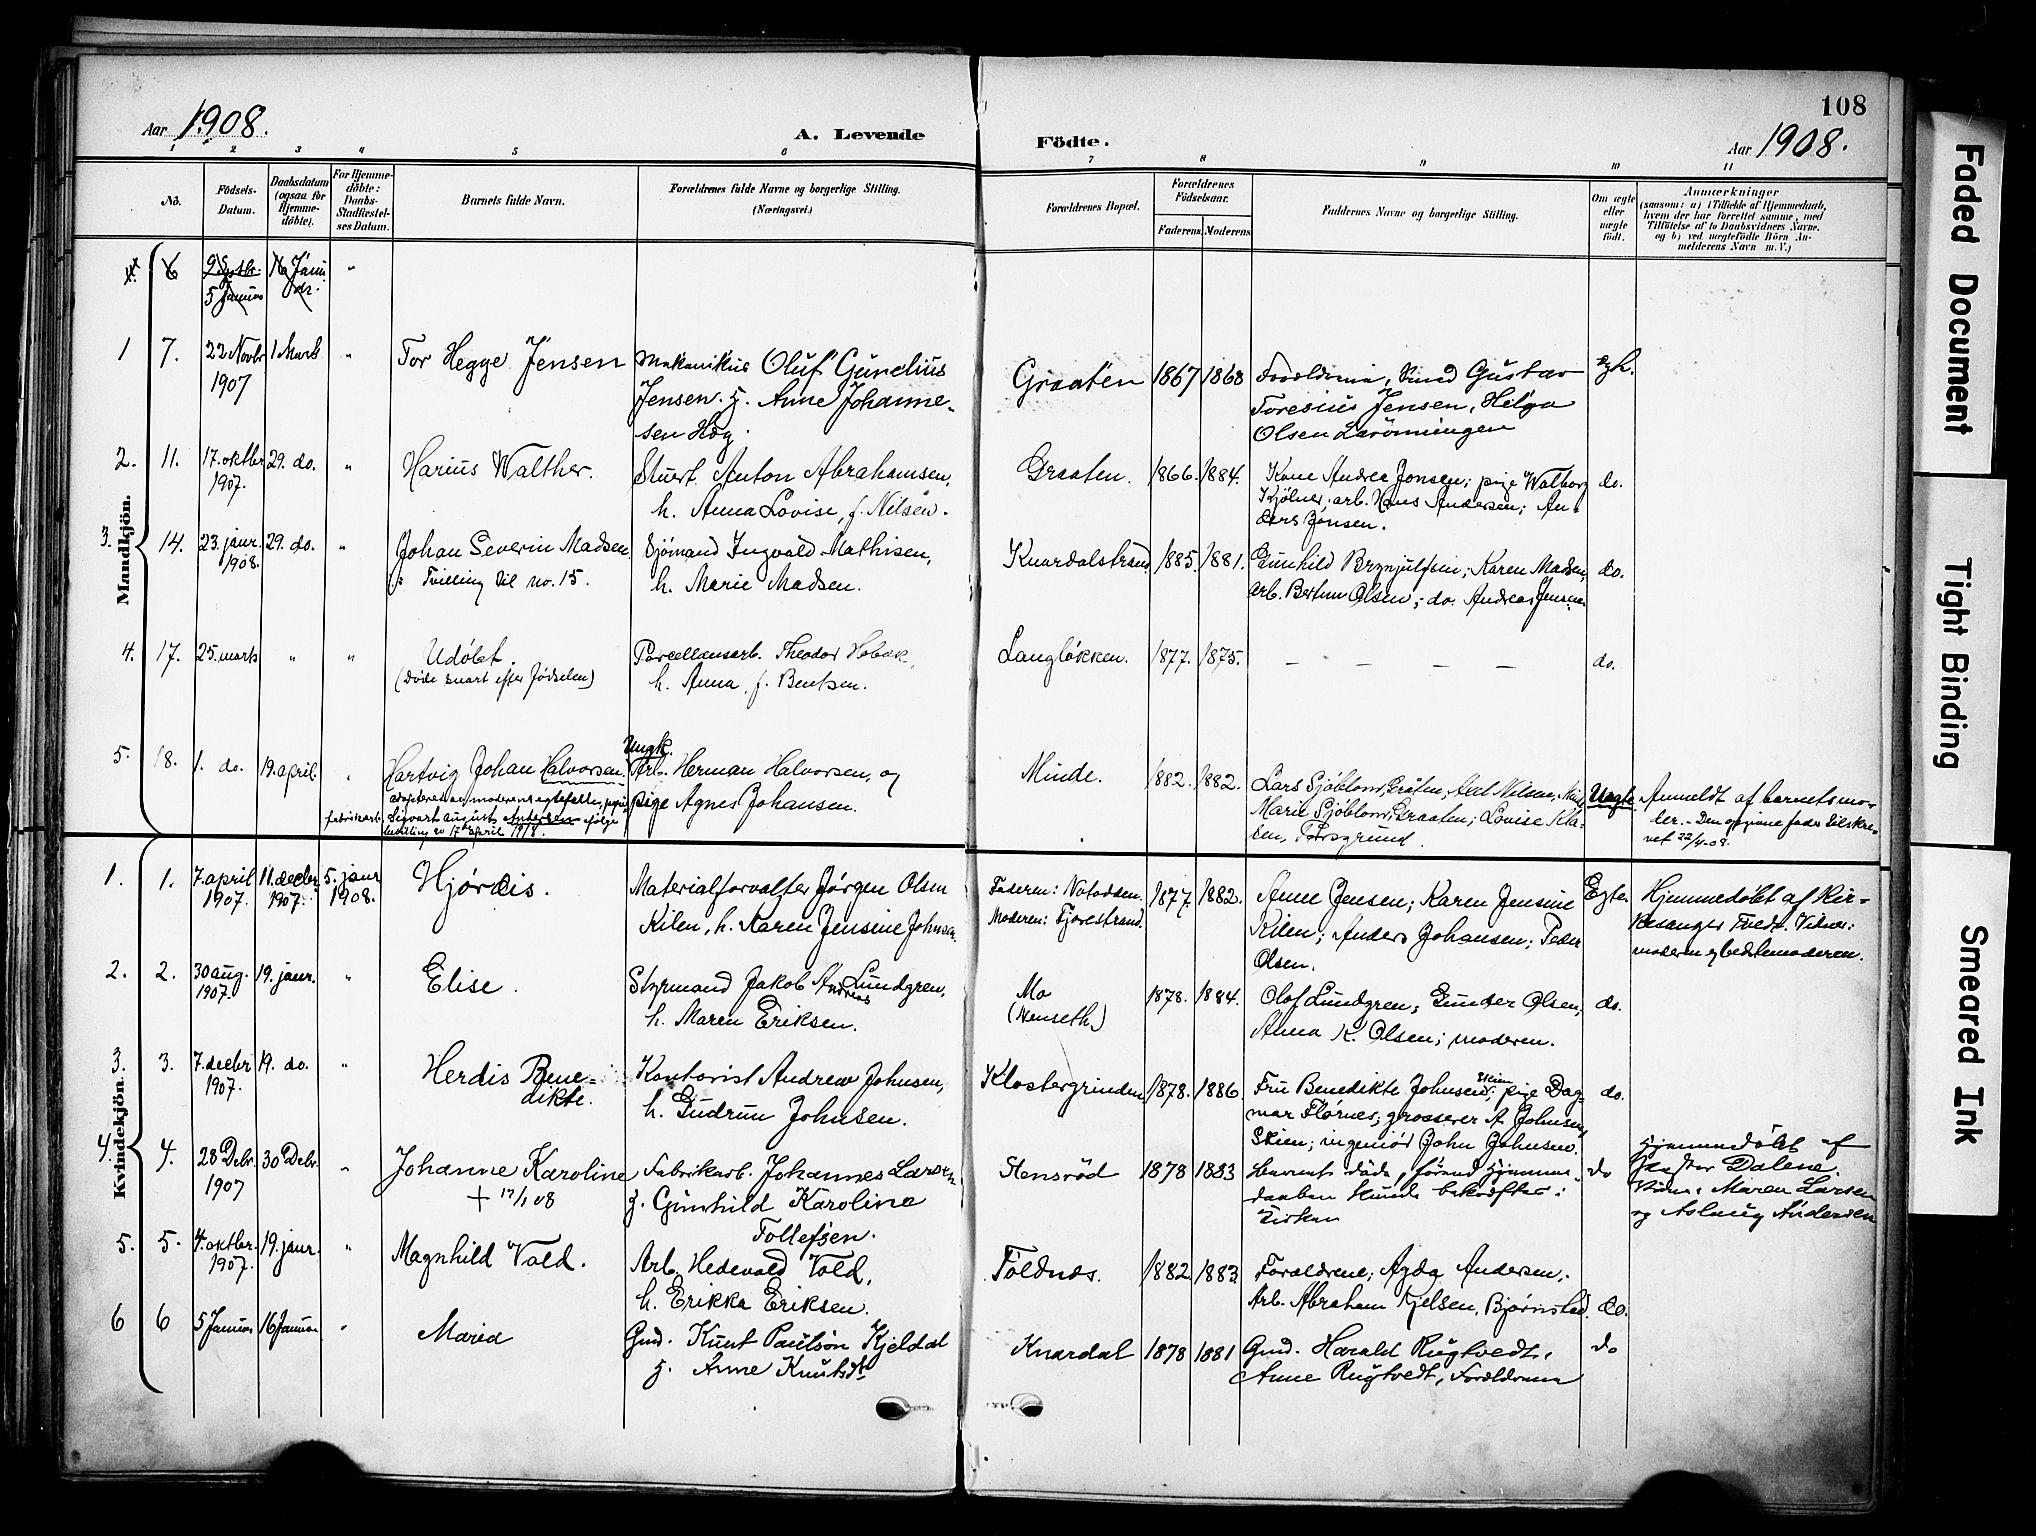 SAKO, Solum kirkebøker, F/Fa/L0011: Ministerialbok nr. I 11, 1898-1909, s. 108